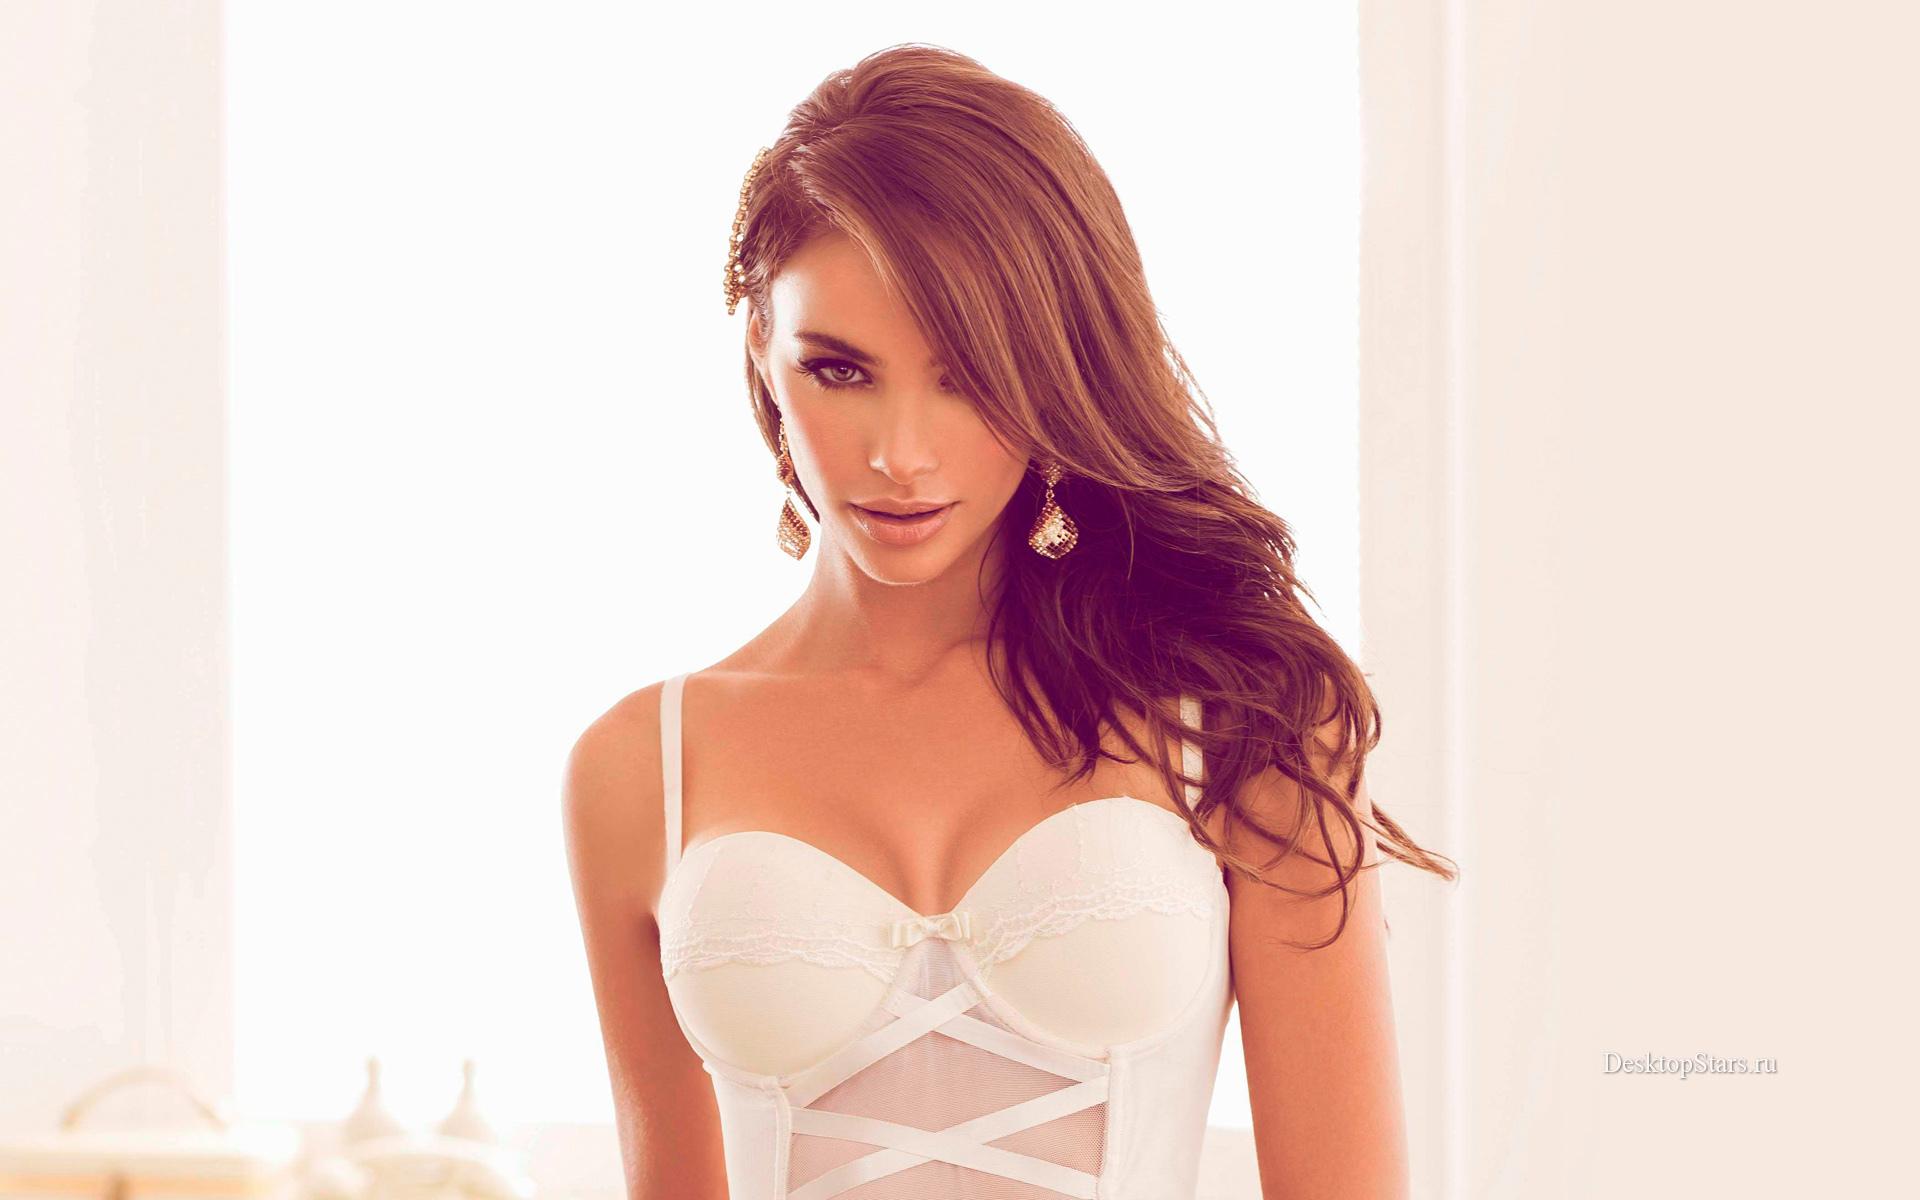 Nicole Meyer Pictures